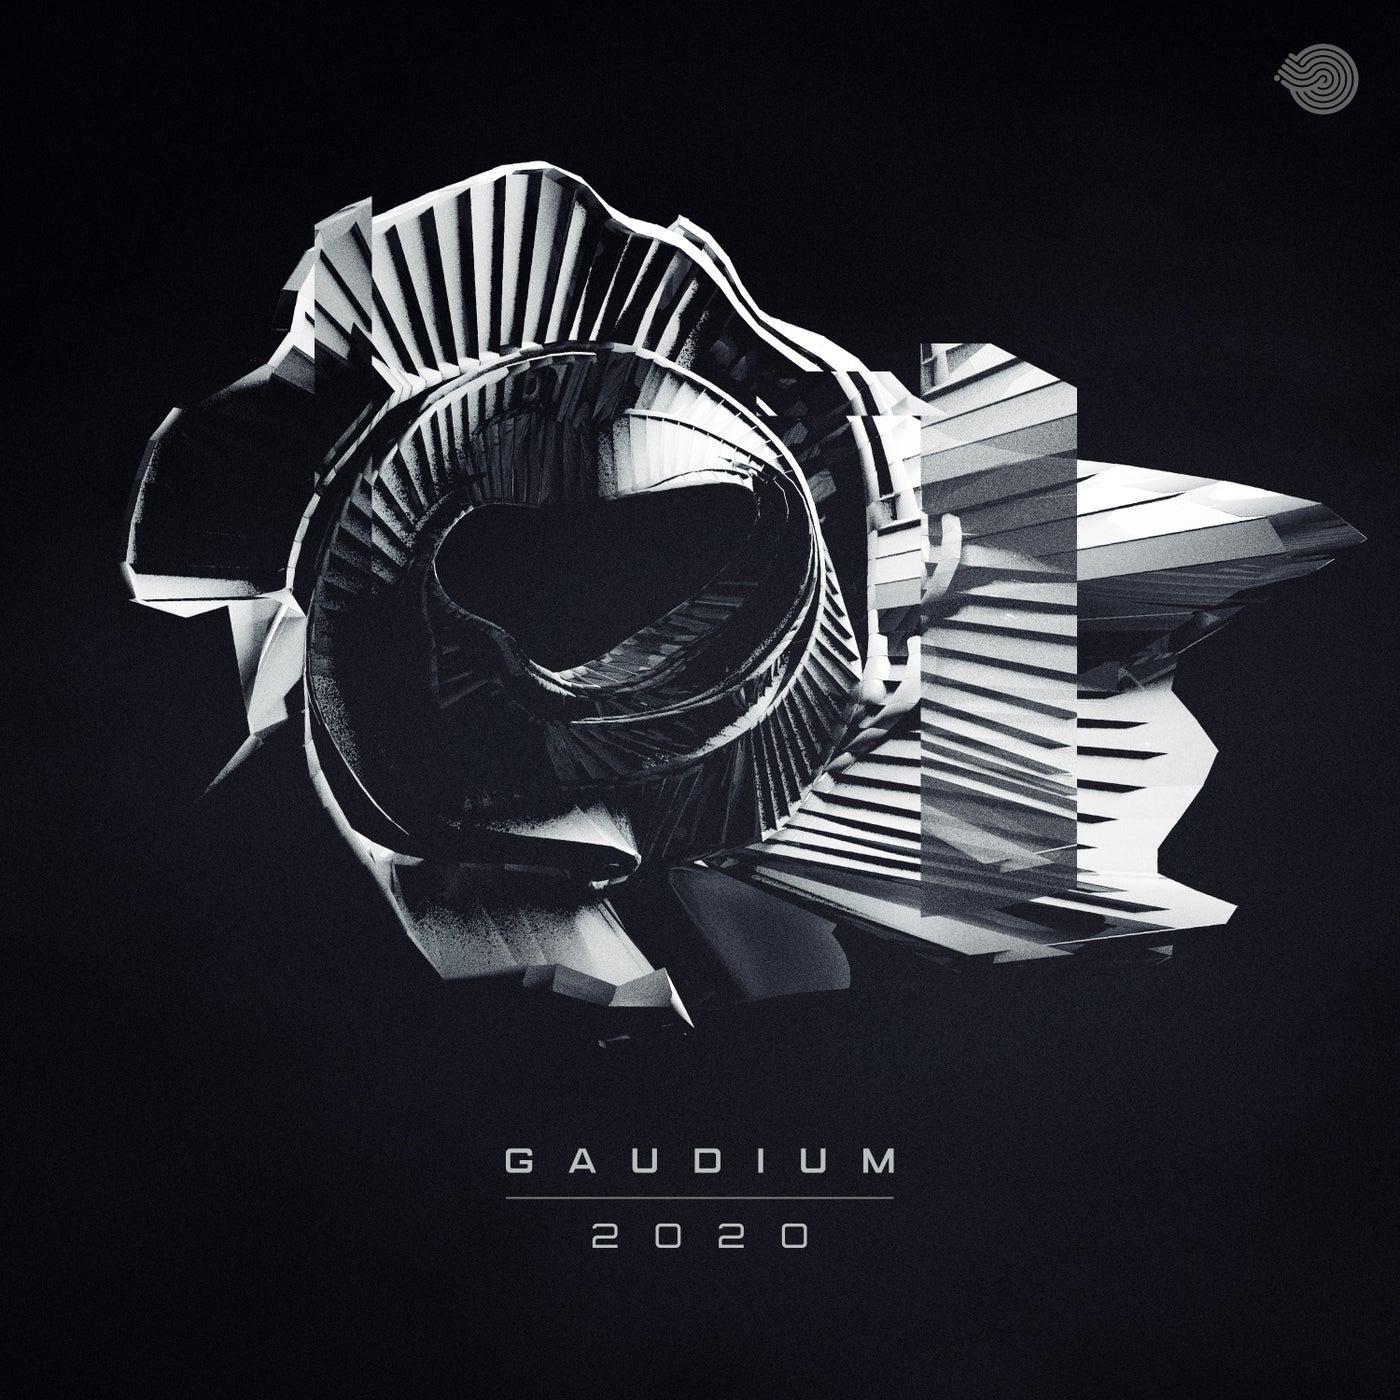 2020 (Original mix)